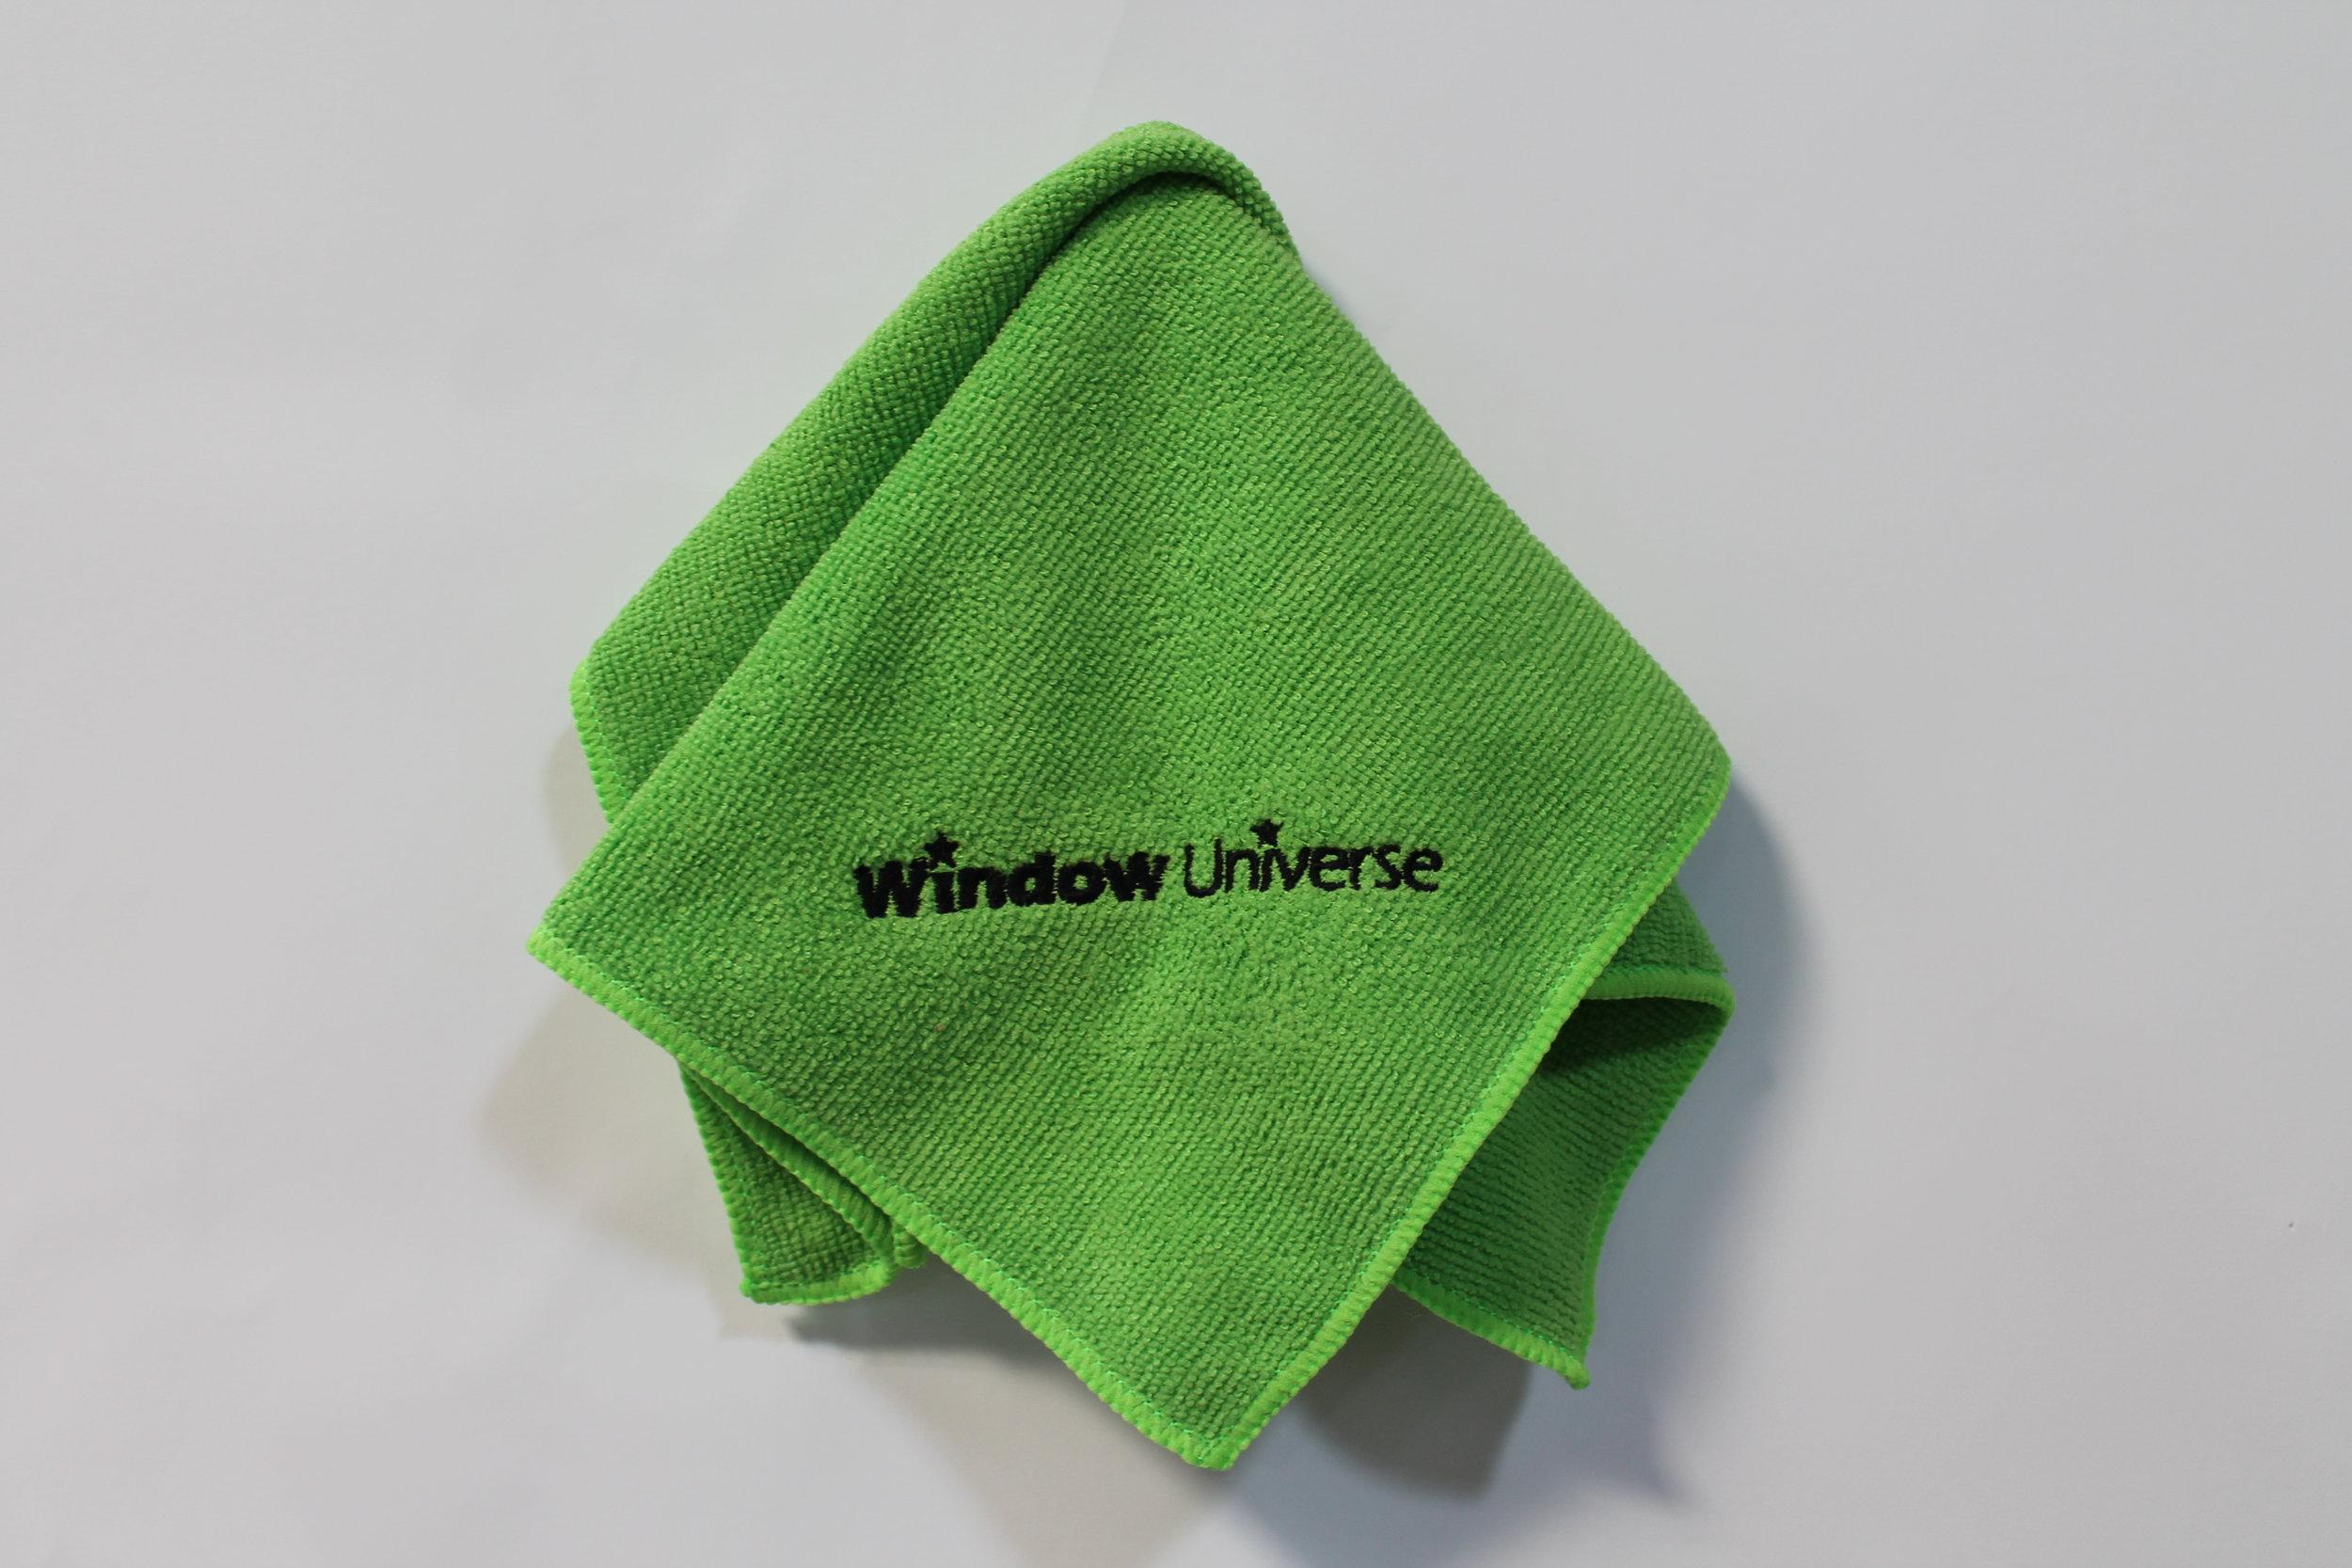 Window_Universe_Towel.JPG